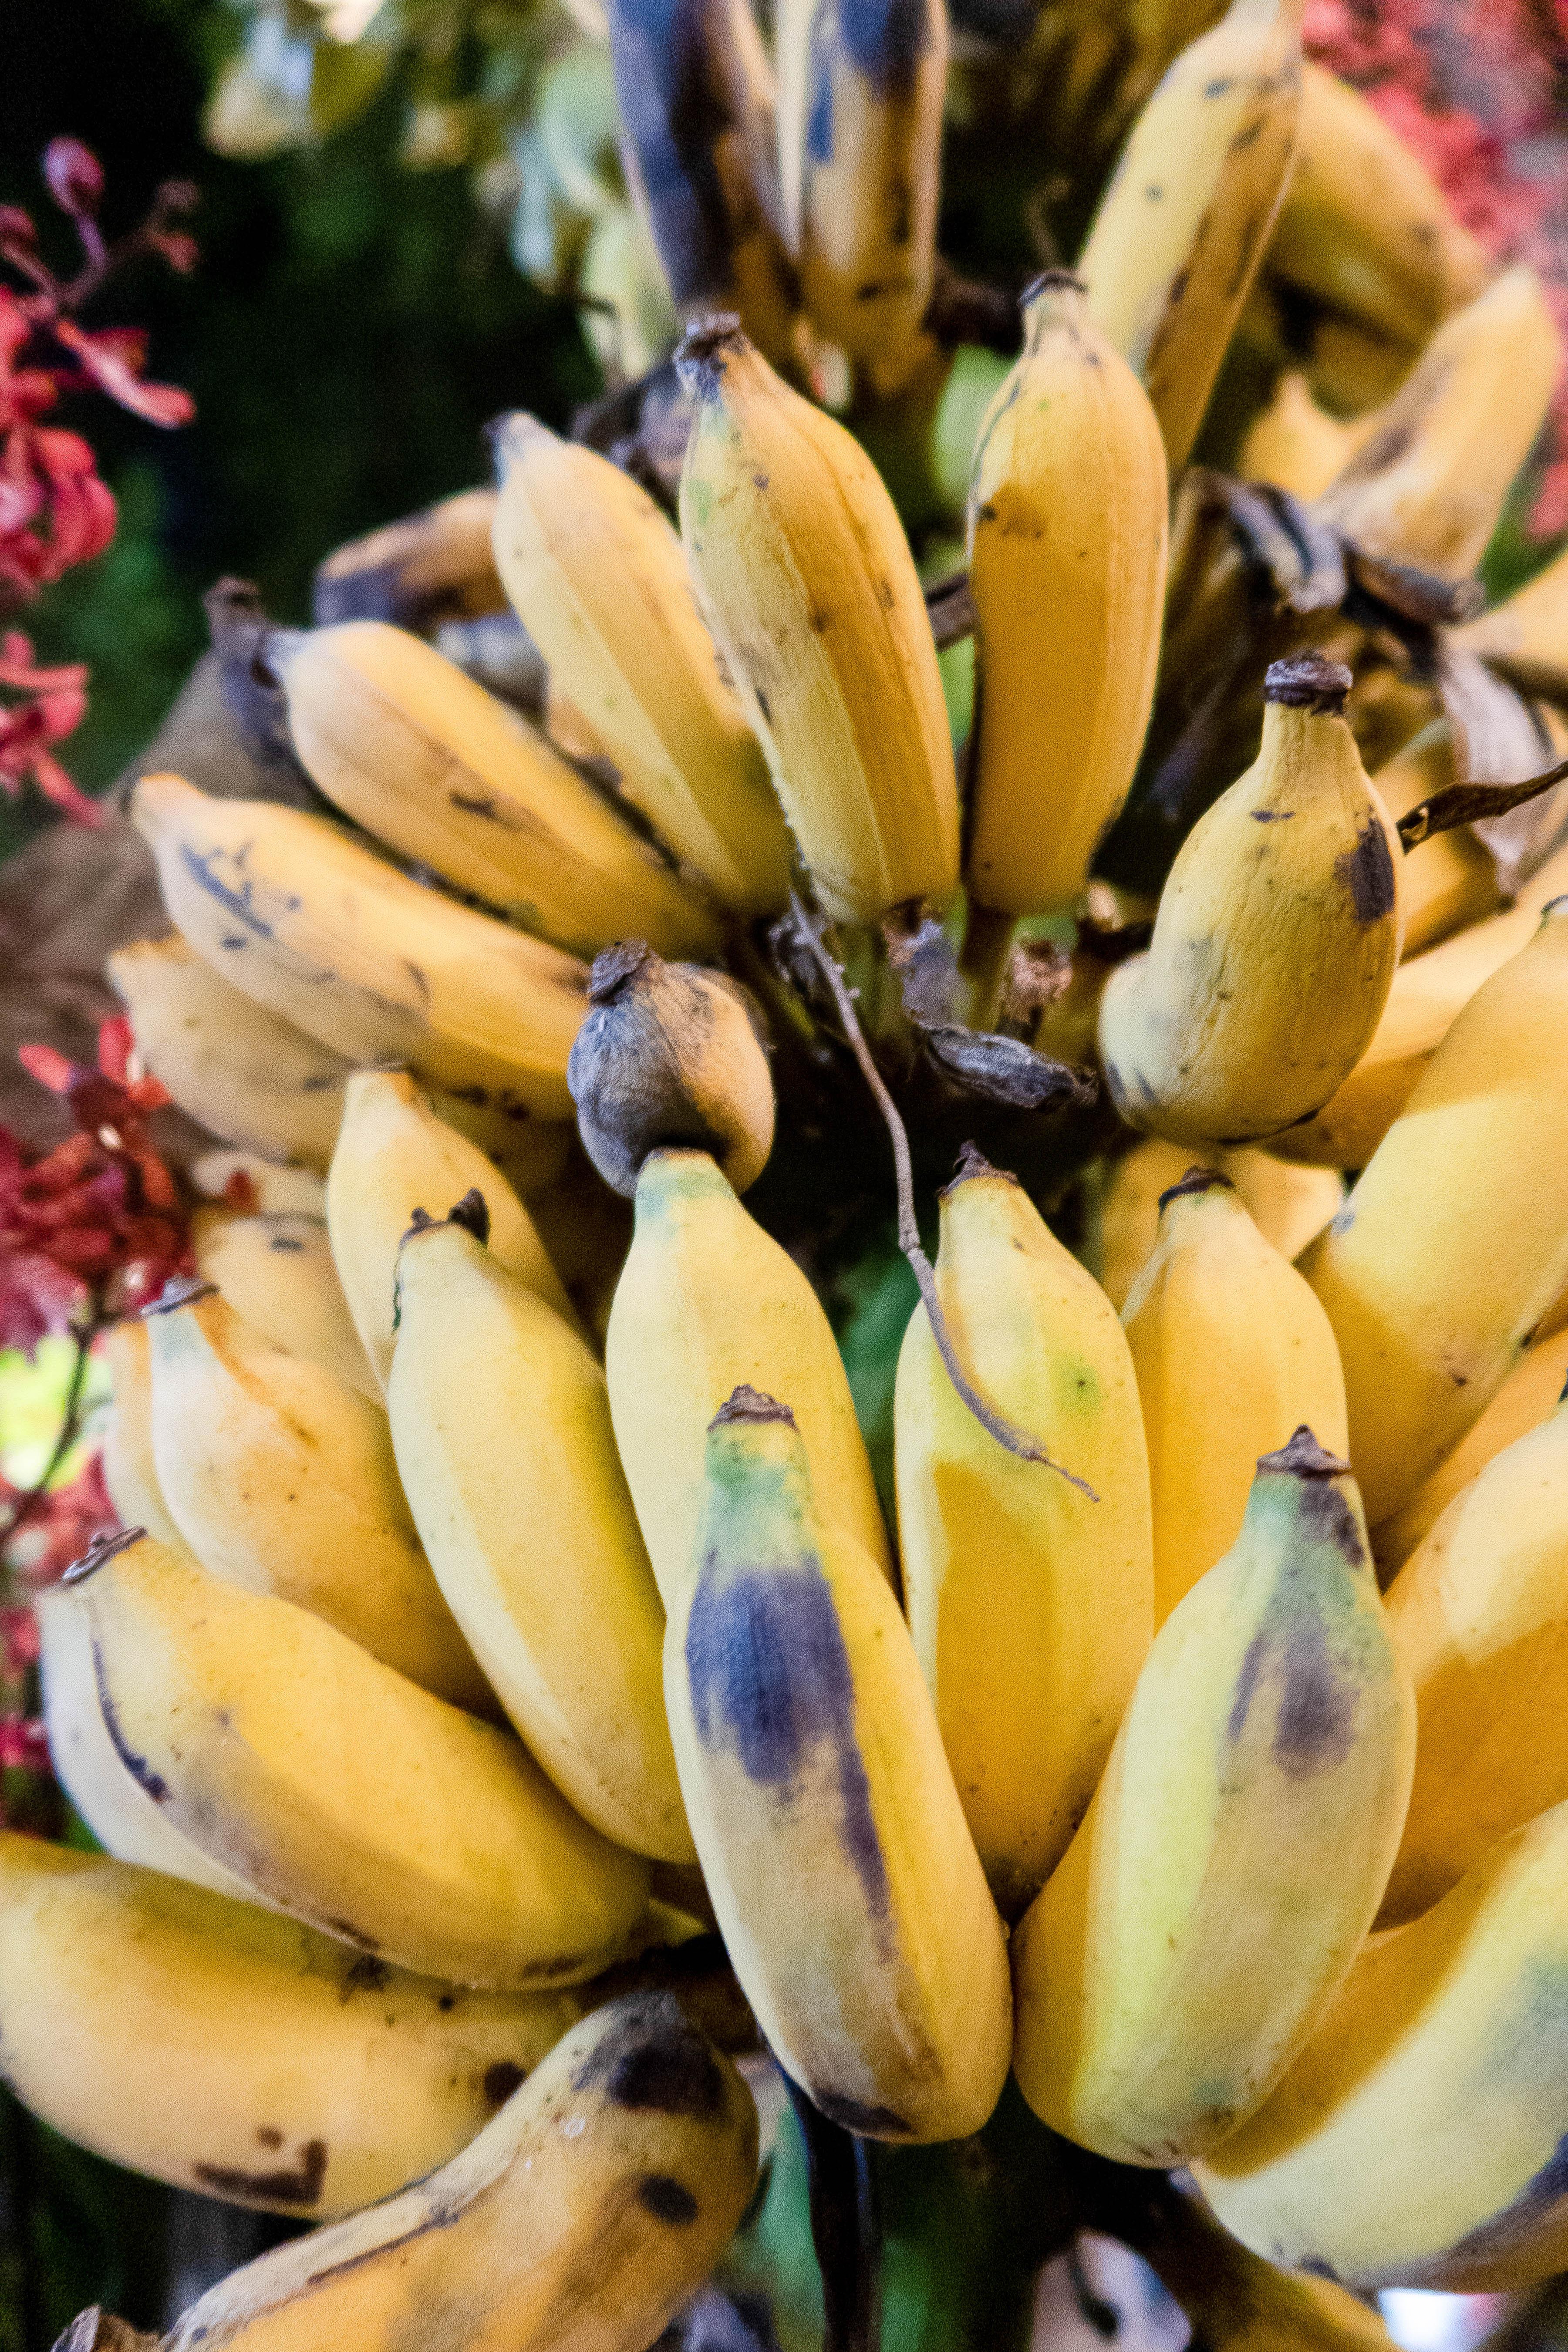 Bananes 2 - FRUITS & LÉGUMES